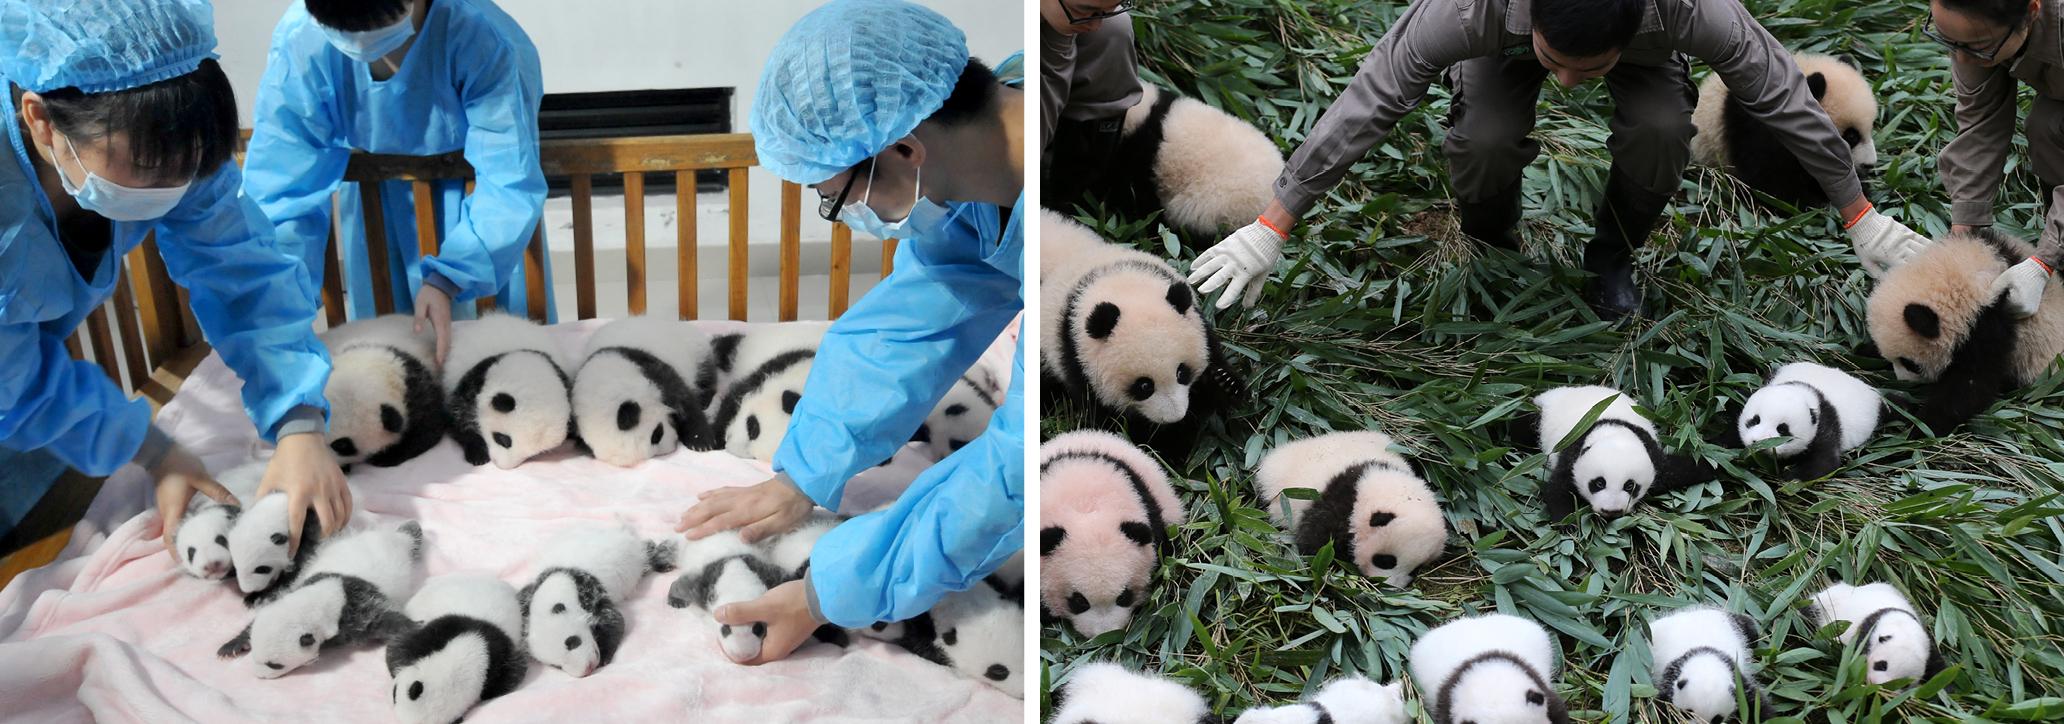 Sperm harvesting panda galleries 808